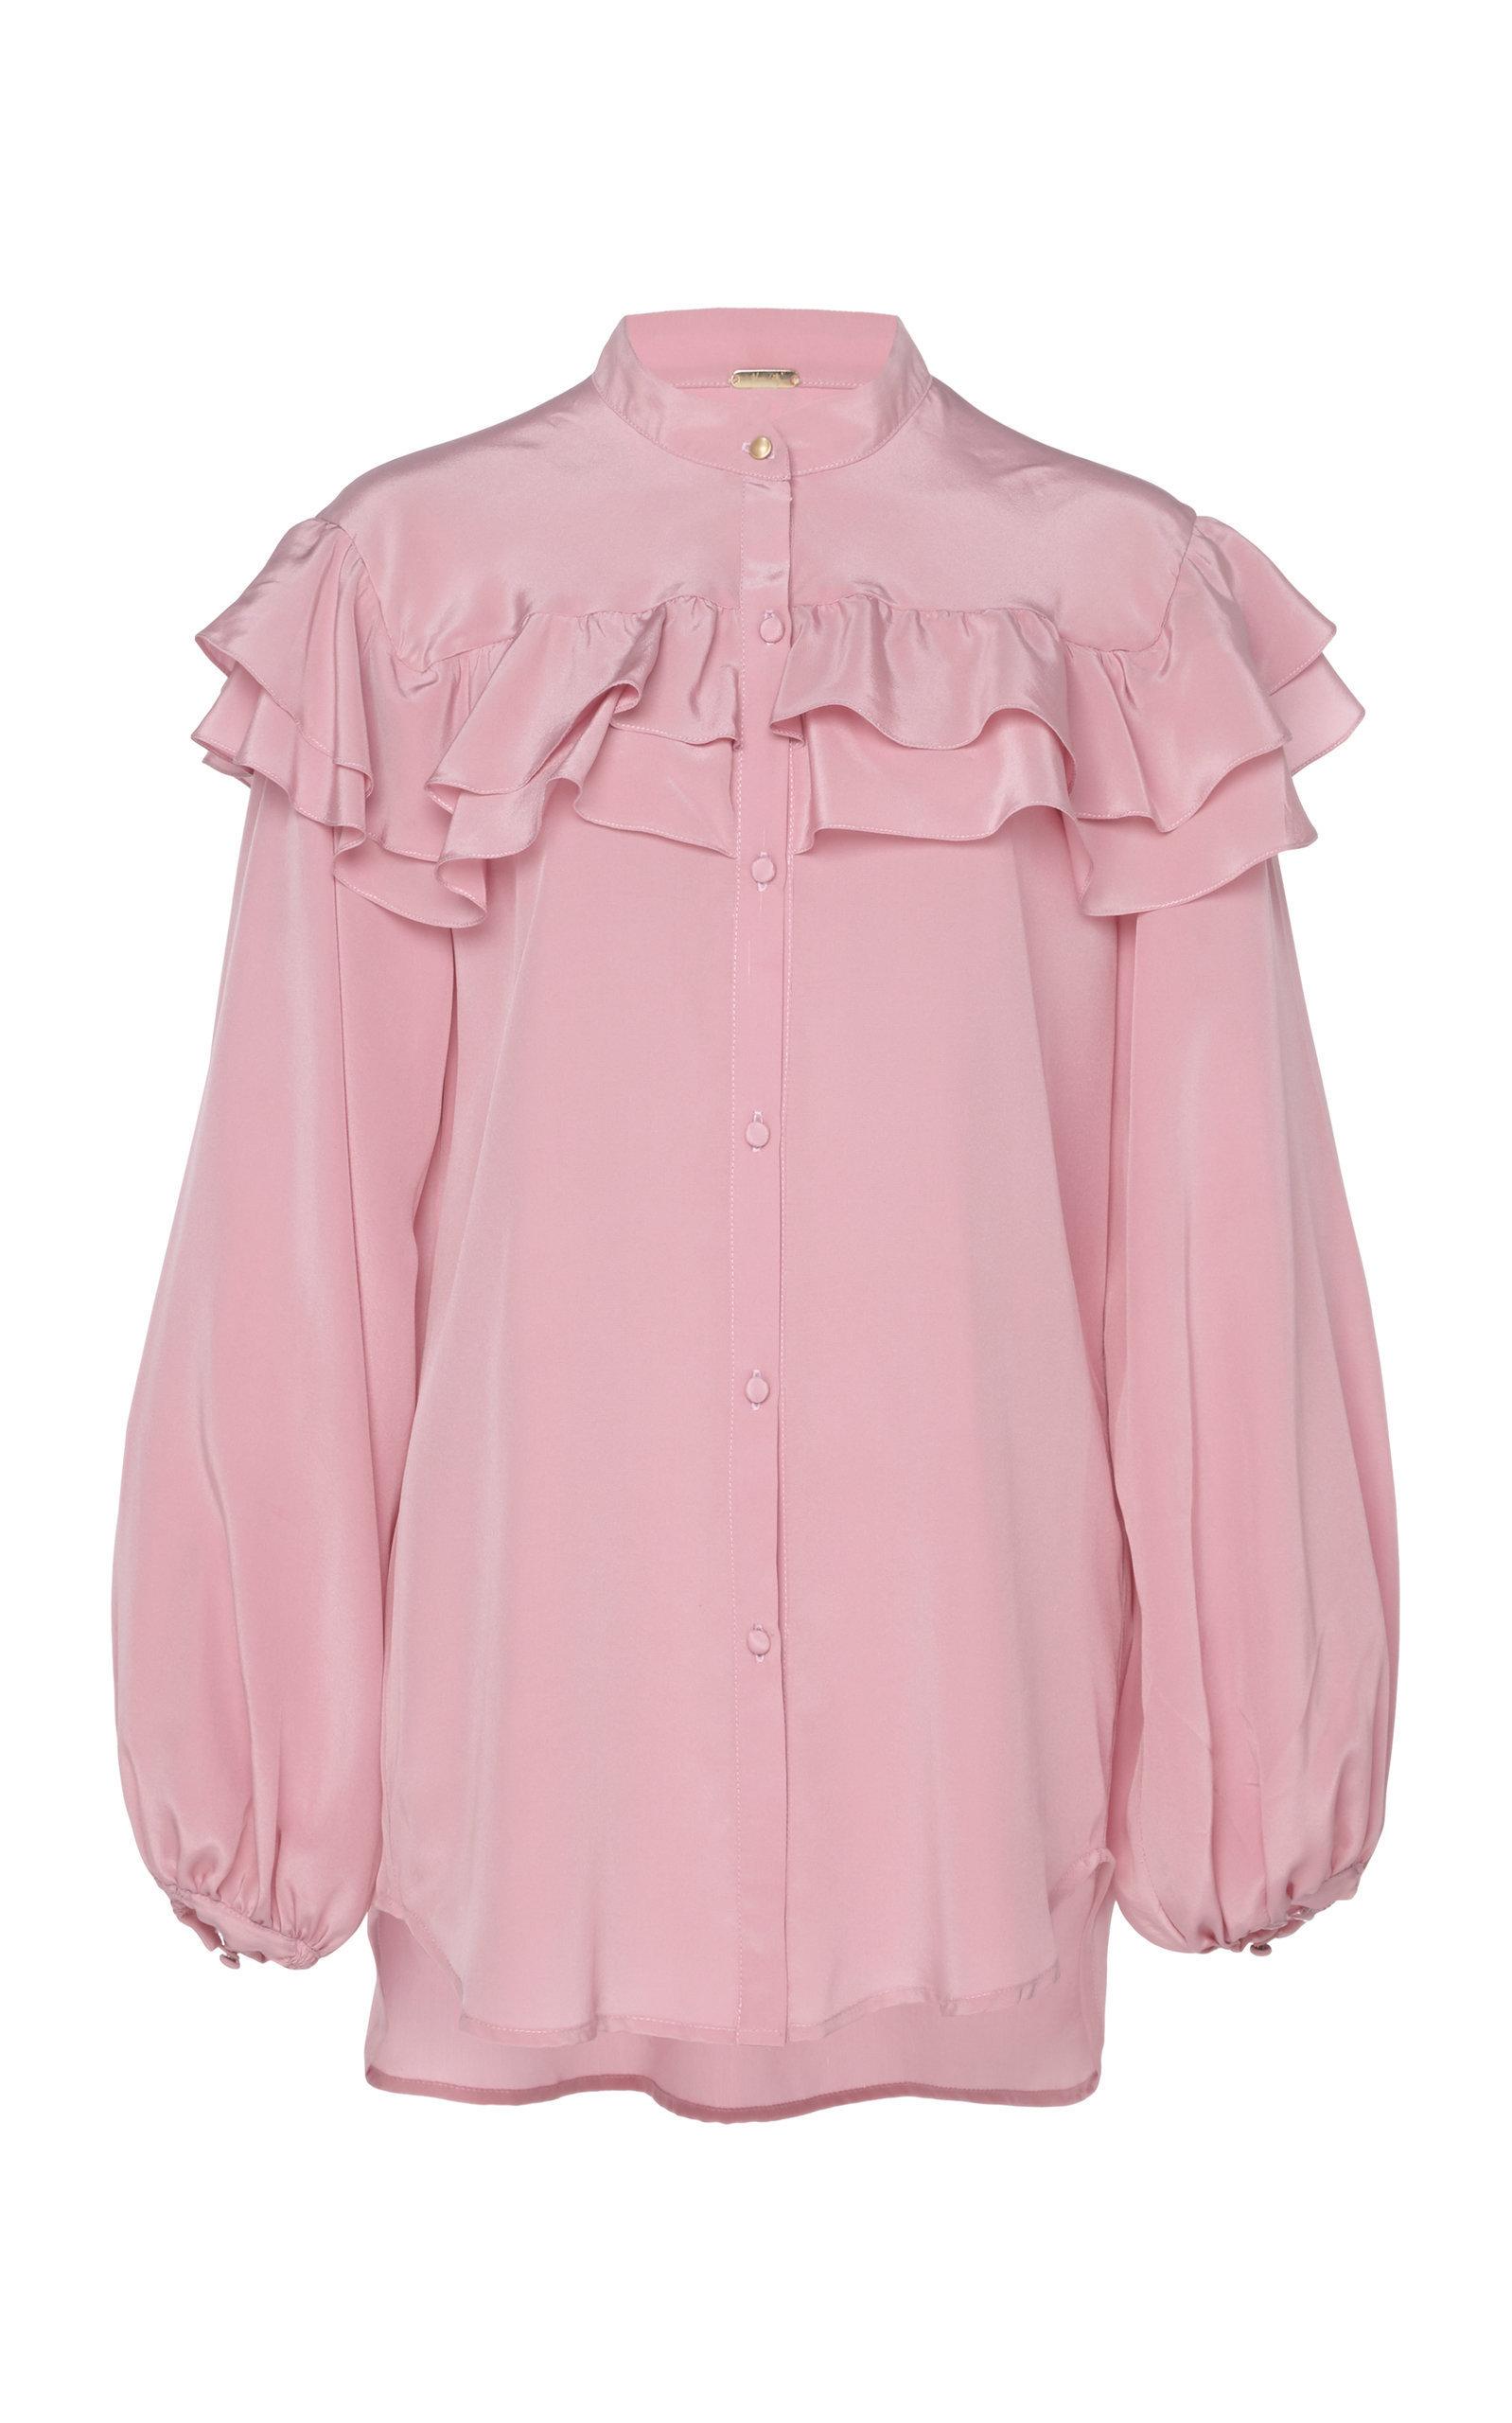 This Is Goya Ruffled Silk Top